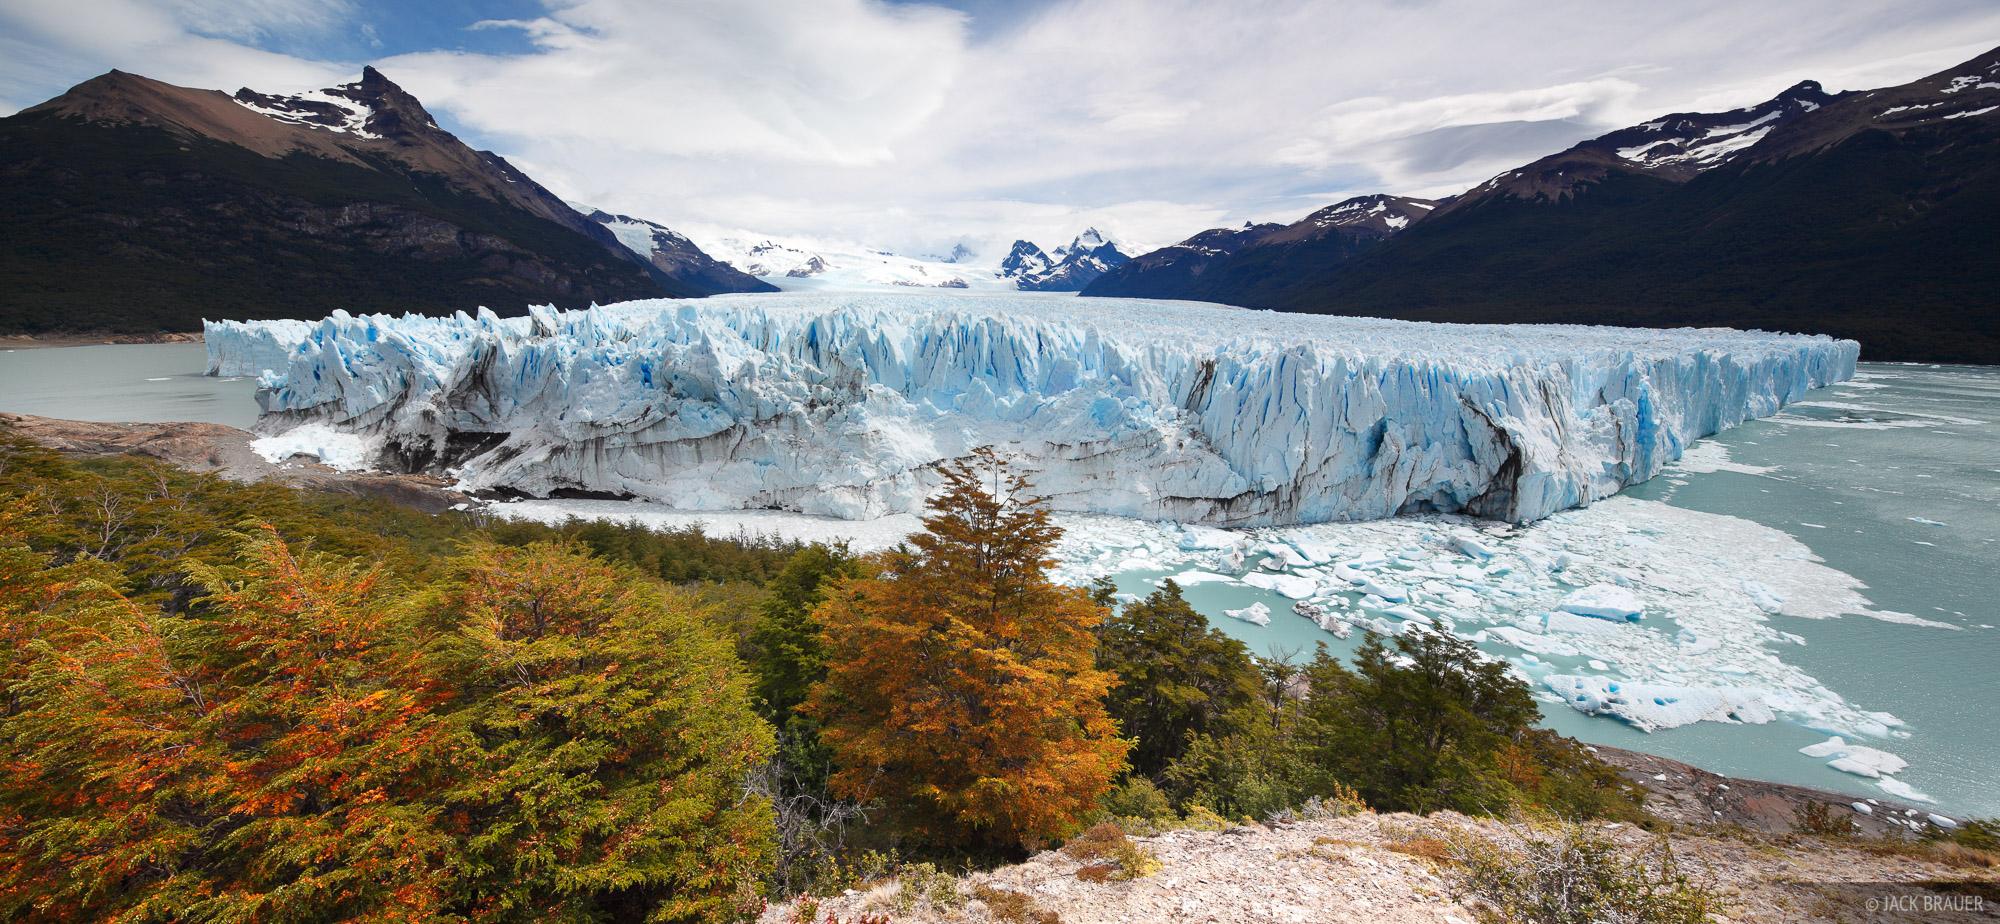 Glaciar Perito Moreno, panorama, Argentina, Patagonia, glacier, El Calafate, Lago Argentino